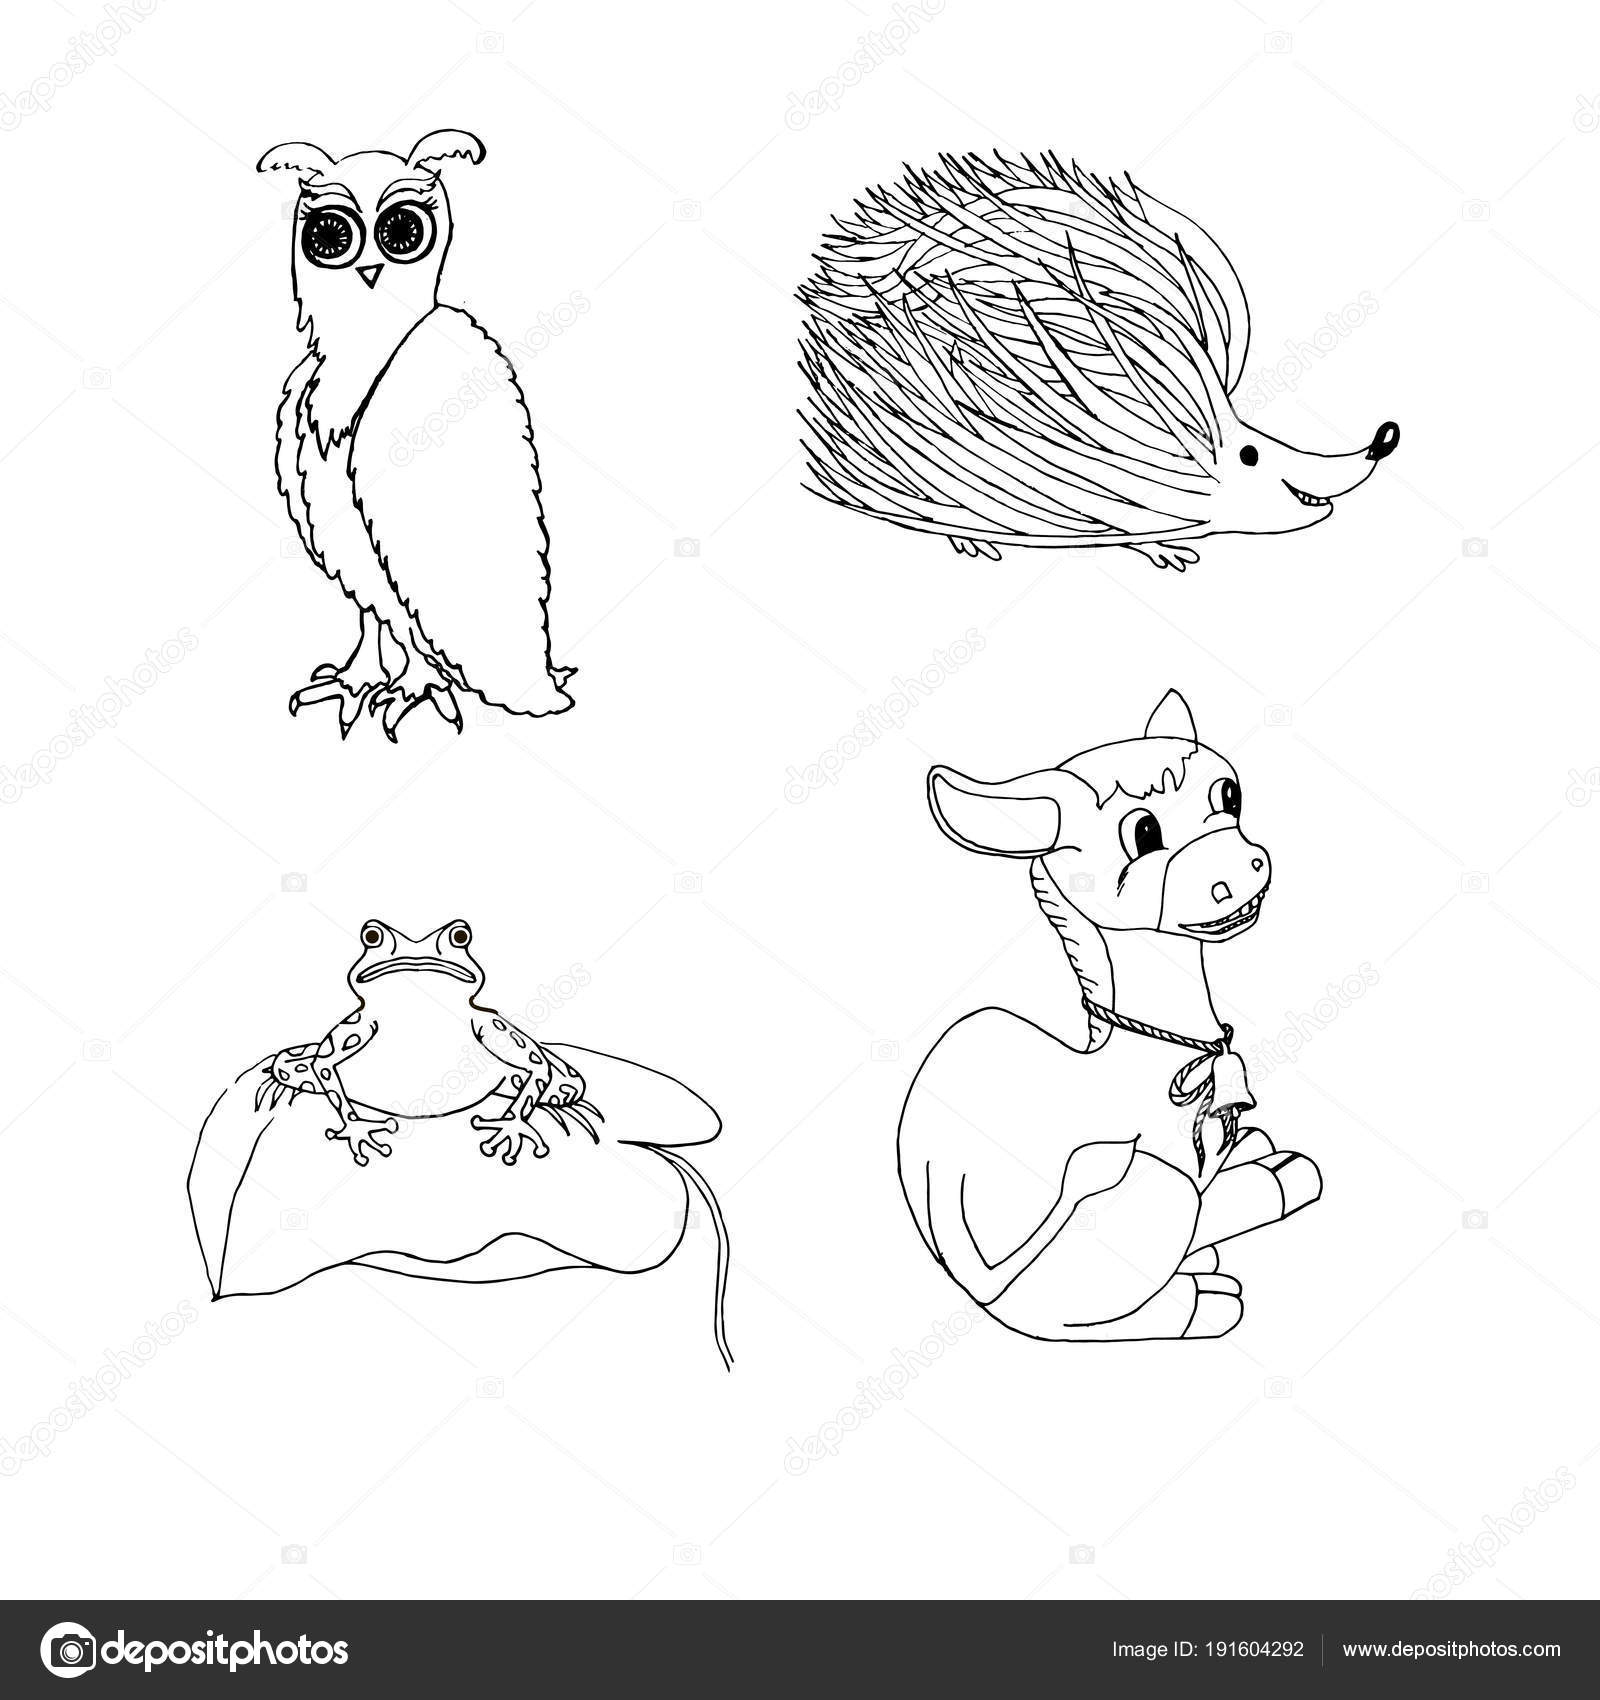 Animales Para Colorear Página Mano Dibujada Rana Buho Burro ...